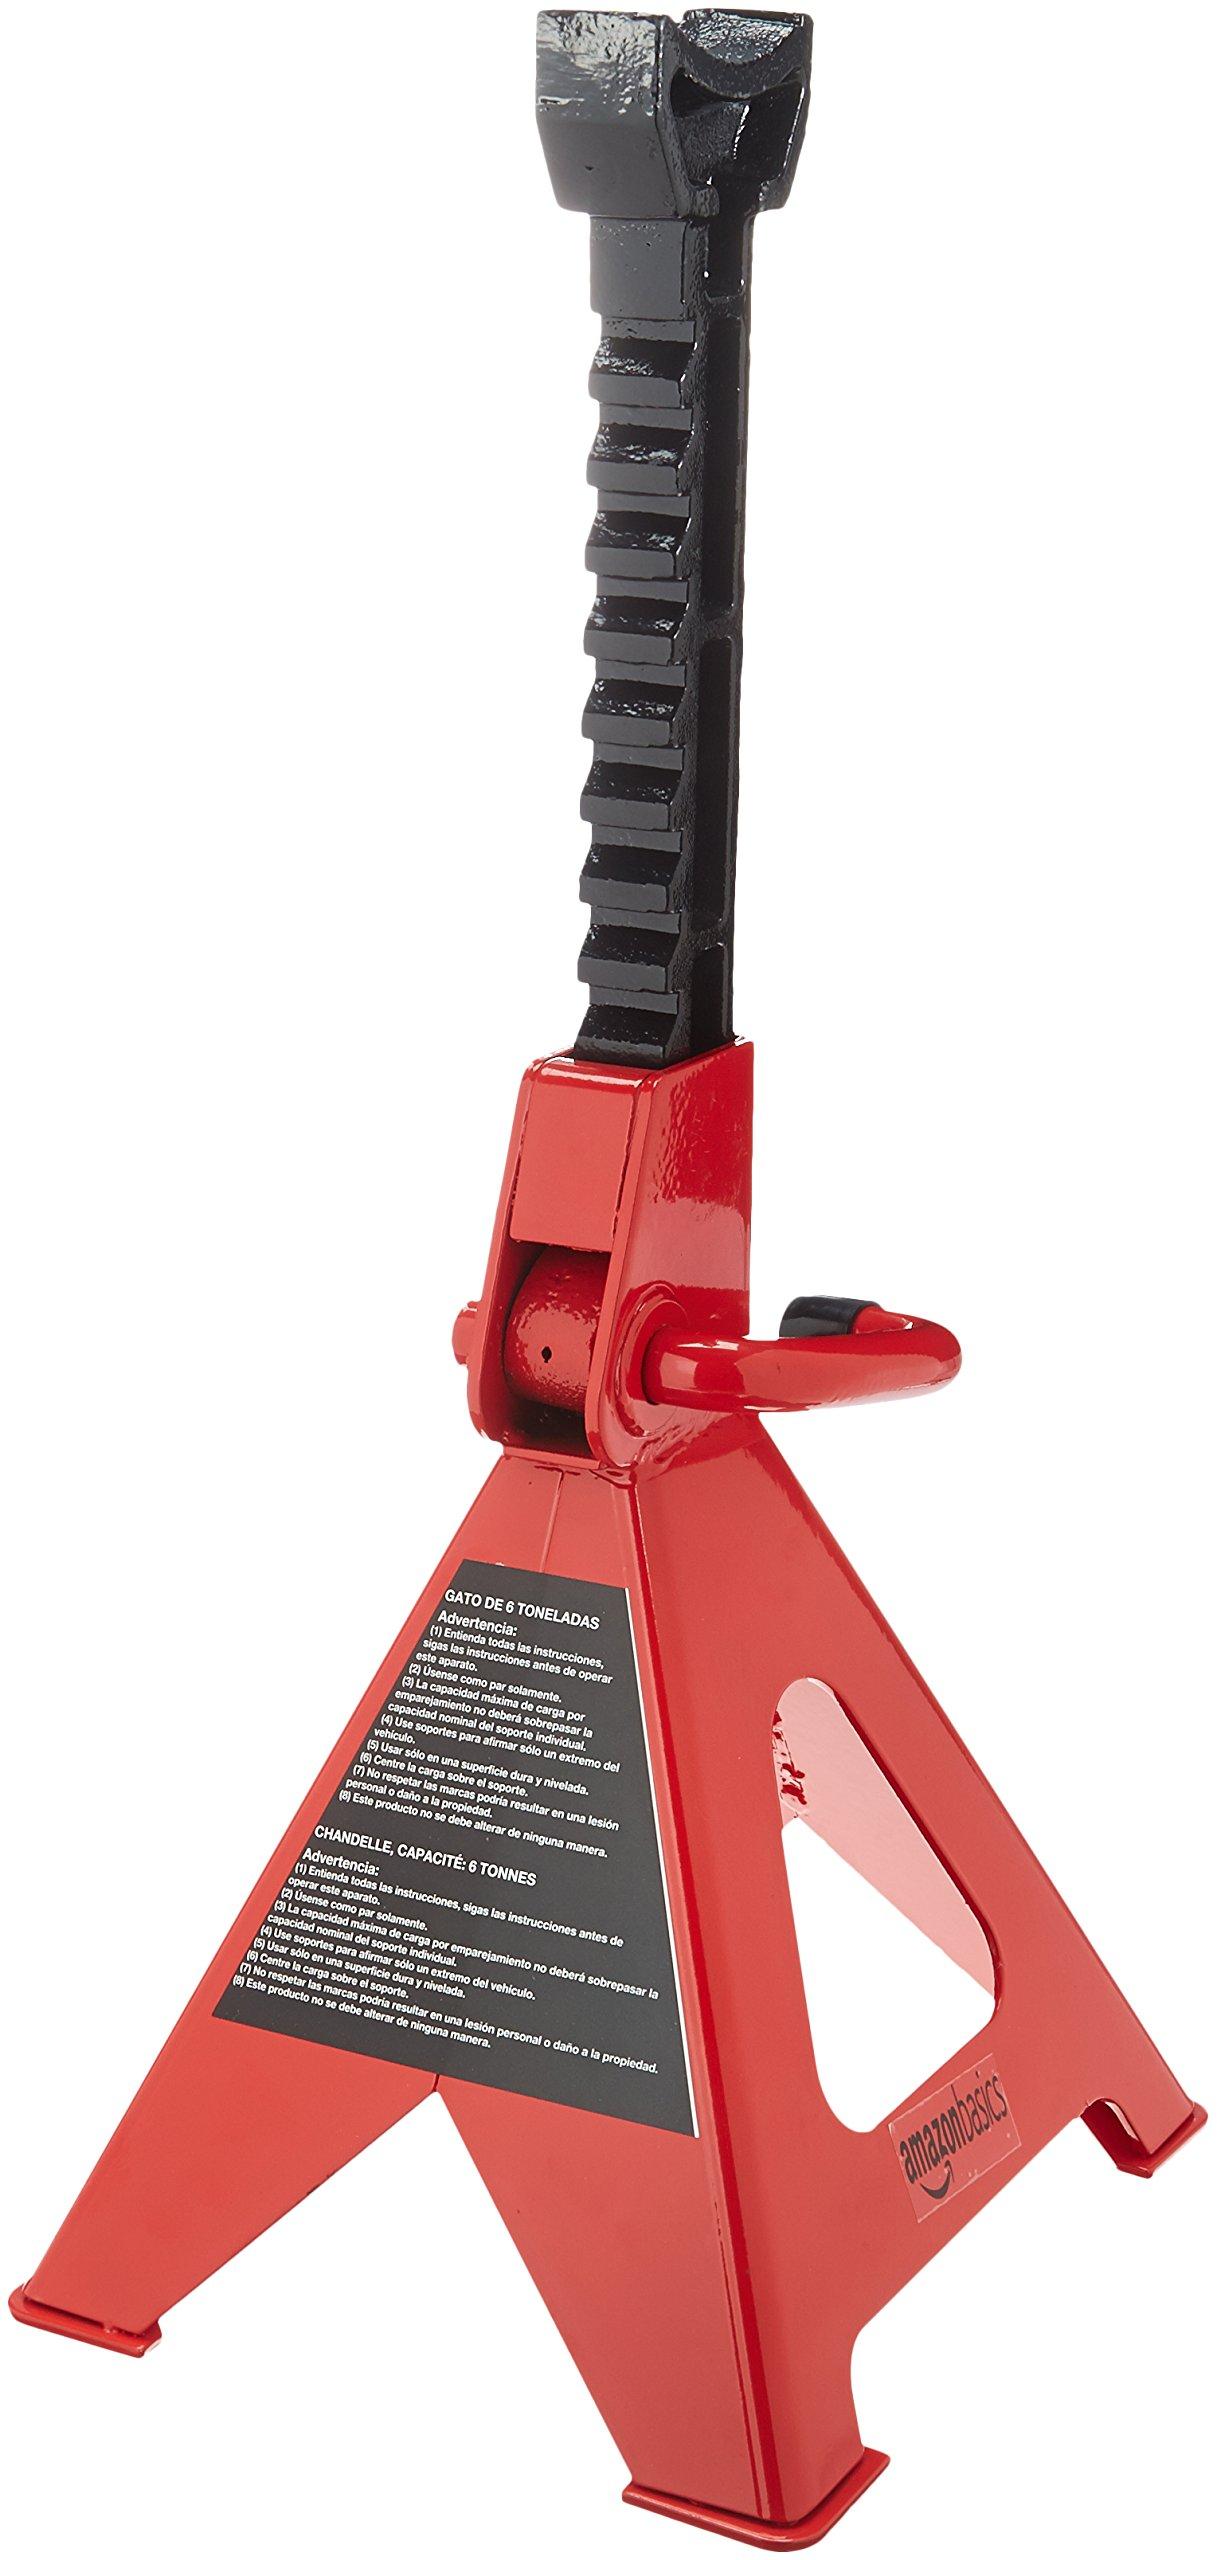 AmazonBasics SW-STJK06 Steel Jack Stands, 6 Ton Capacity - 1 Pair by AmazonBasics (Image #3)